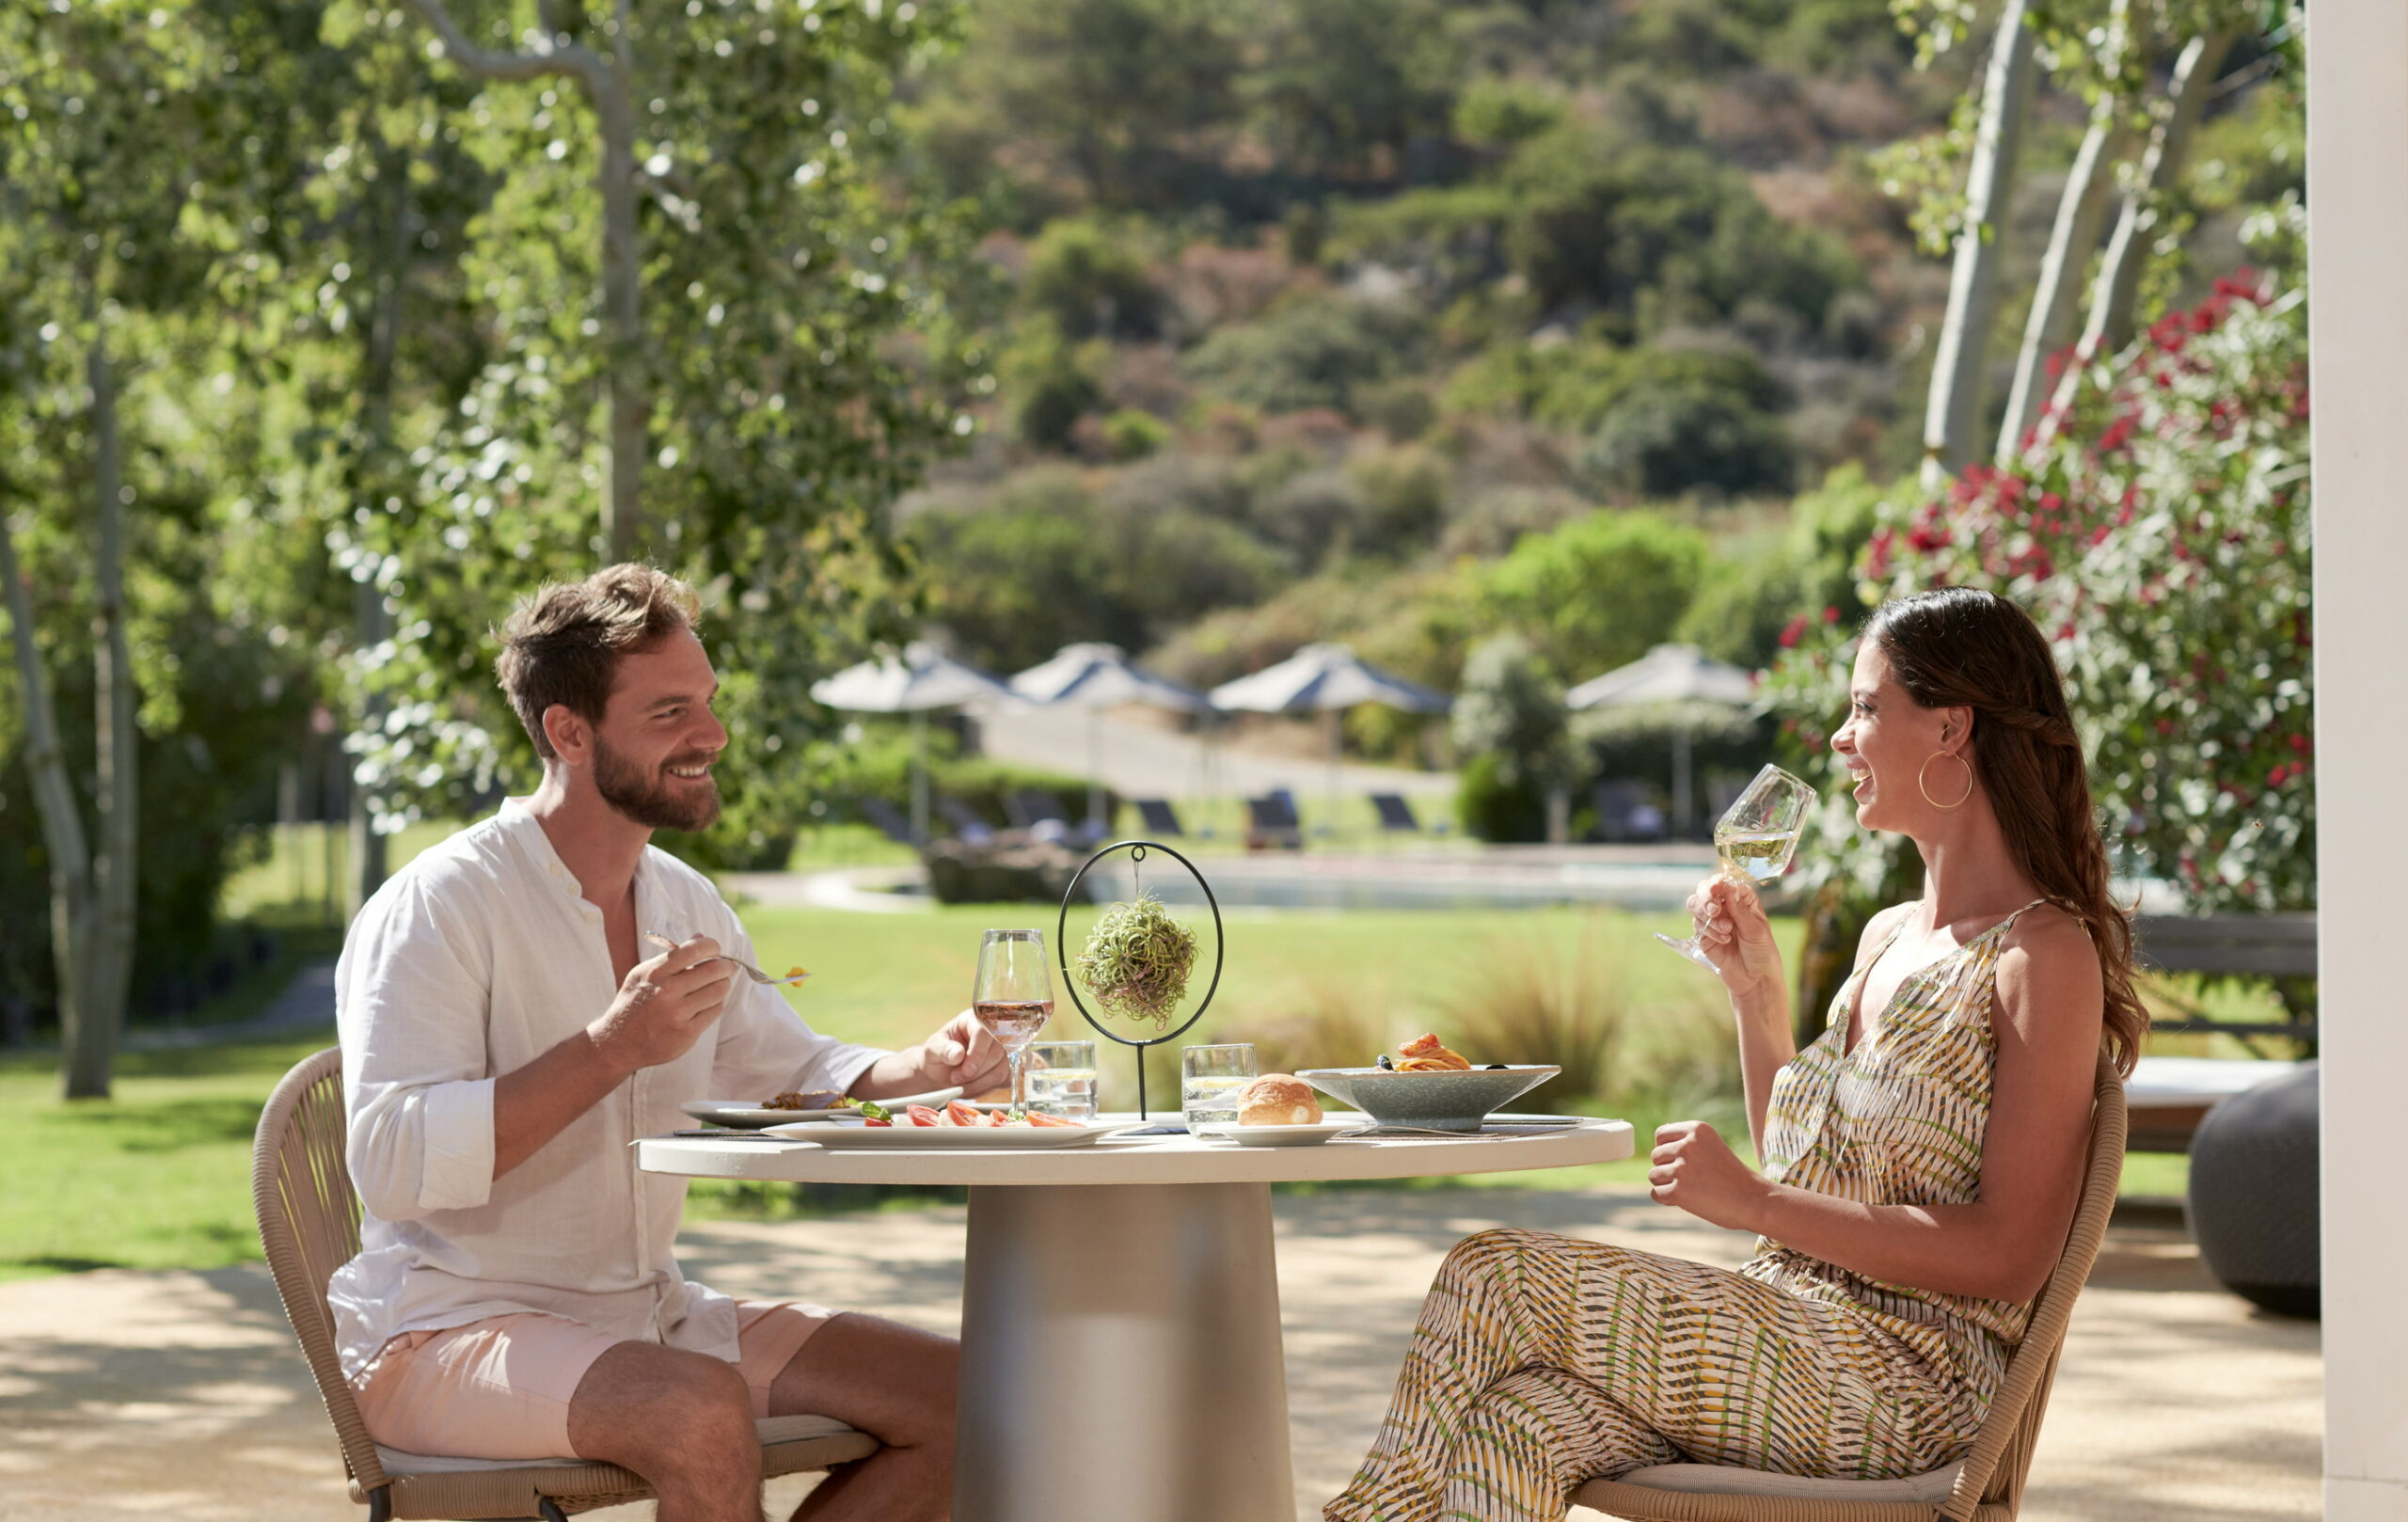 https://www.chialagunaresort.com/wp-content/uploads/2021/05/Baia-di-Chia-Resort-Sardinia_Il-Canneto-Bar_Lunch-Time_2-scaled.jpg